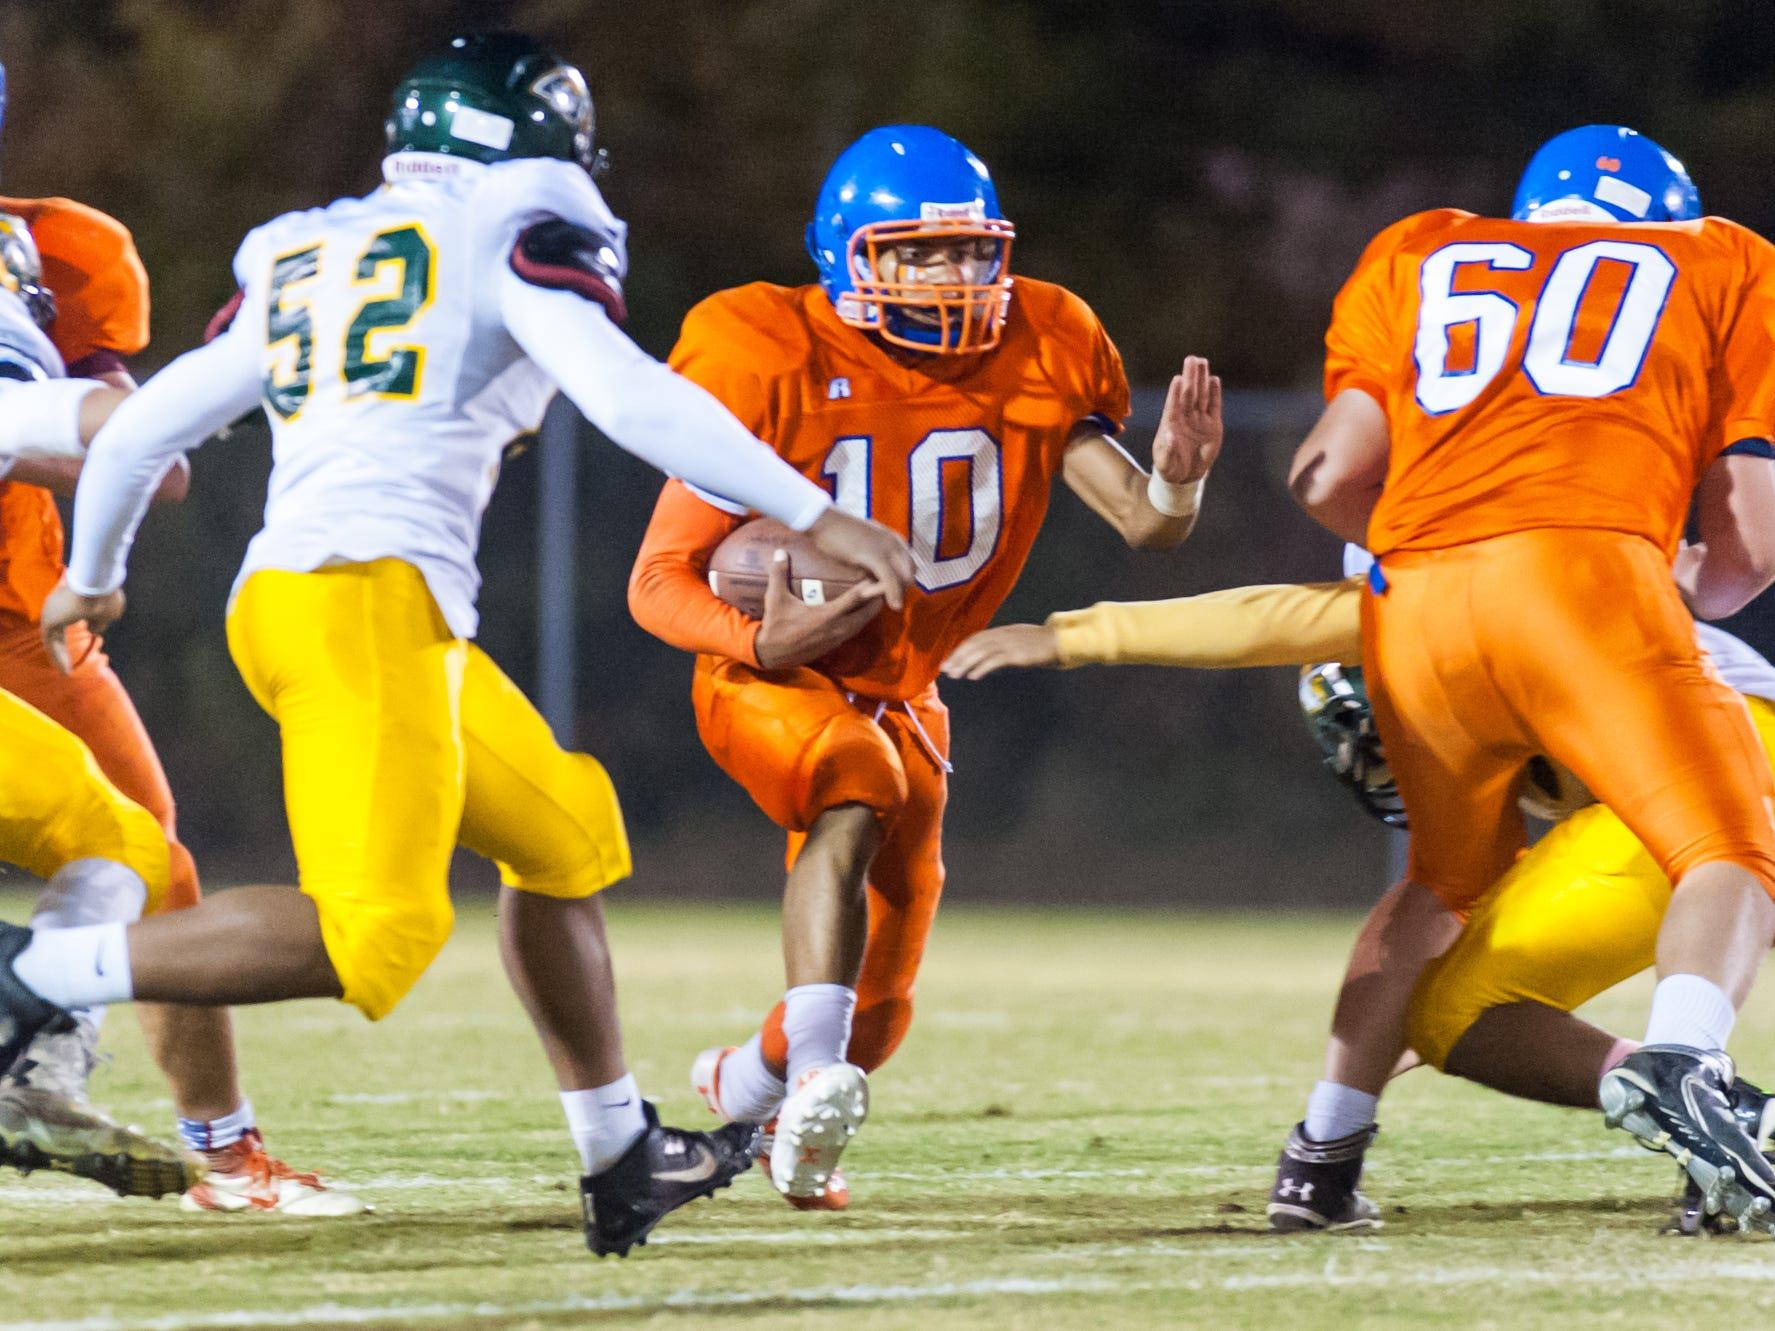 Delmar quarterback Shane Leatherbury (10) hits the hole against Indian River at Delmar High School on Friday evening.